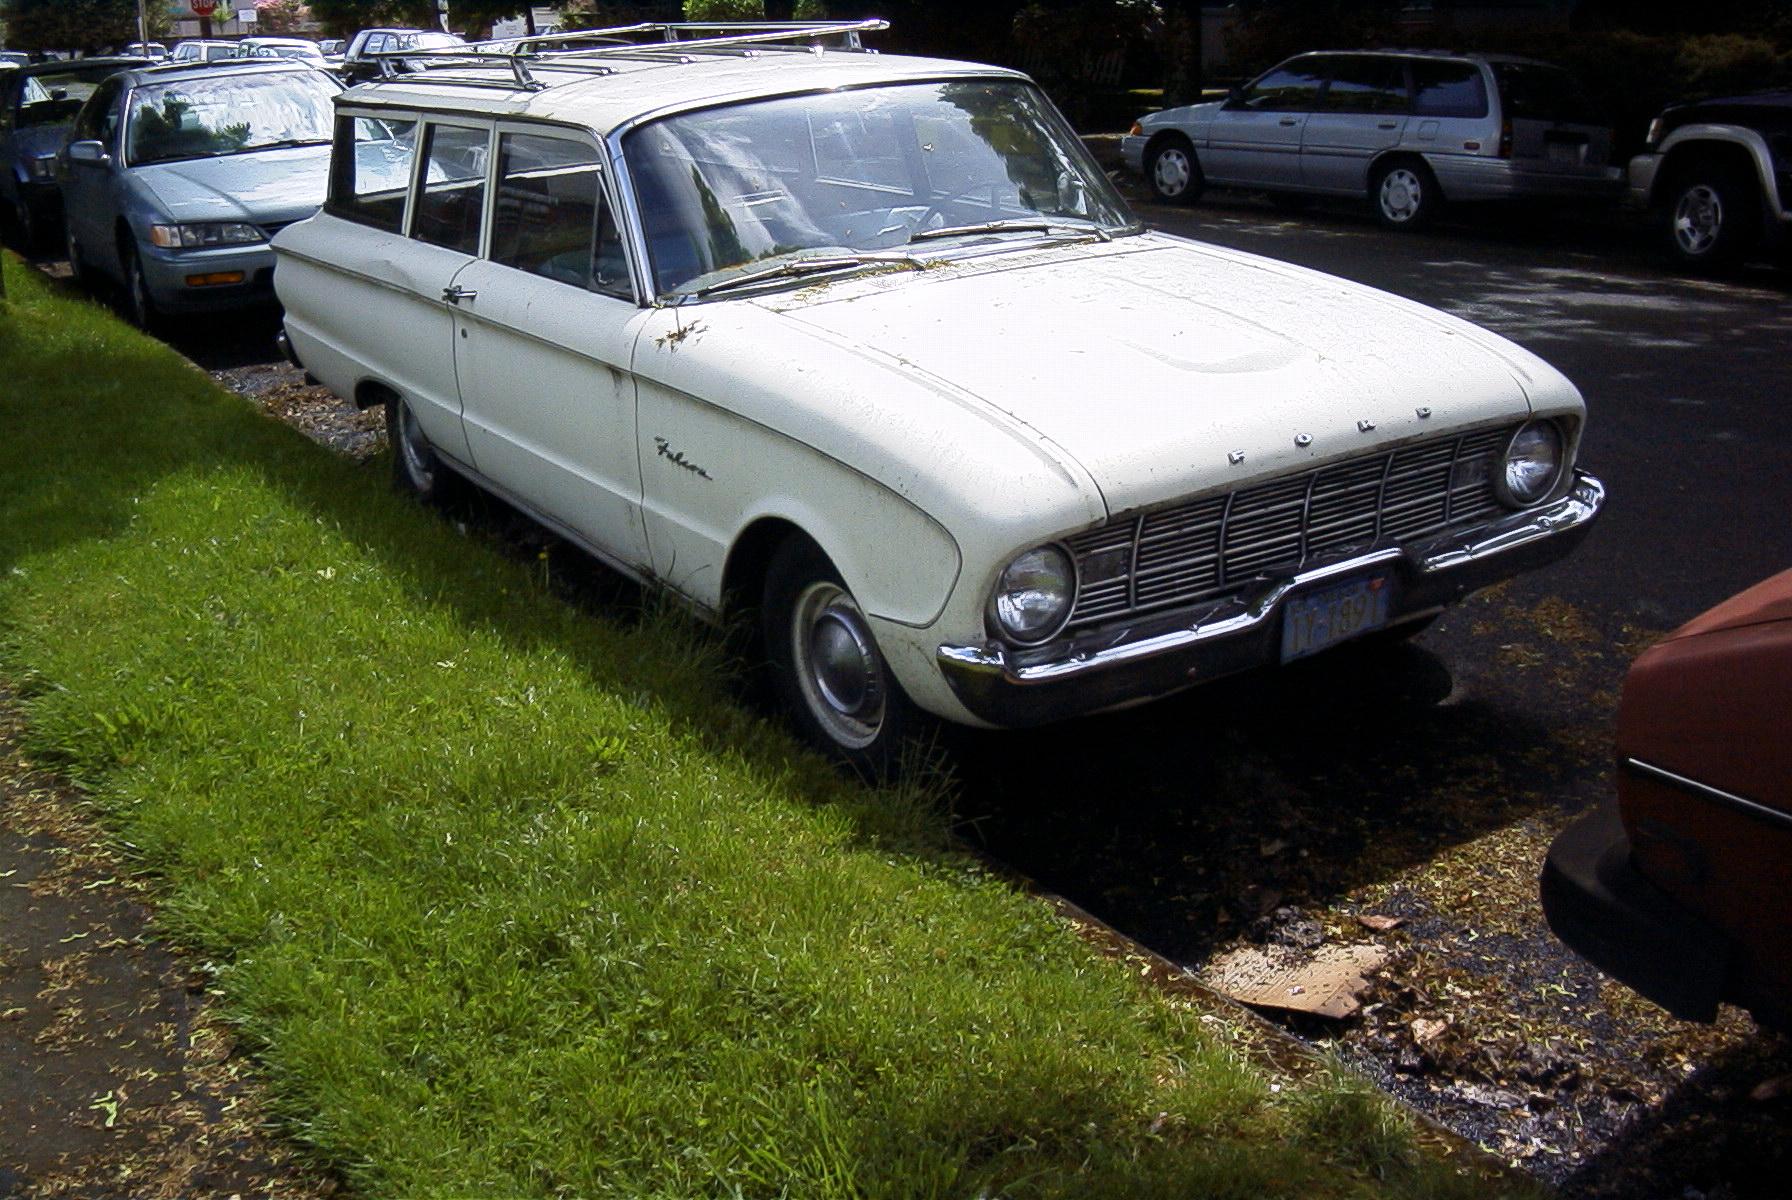 Phil s 60 Ford Falcon tudor station wagon